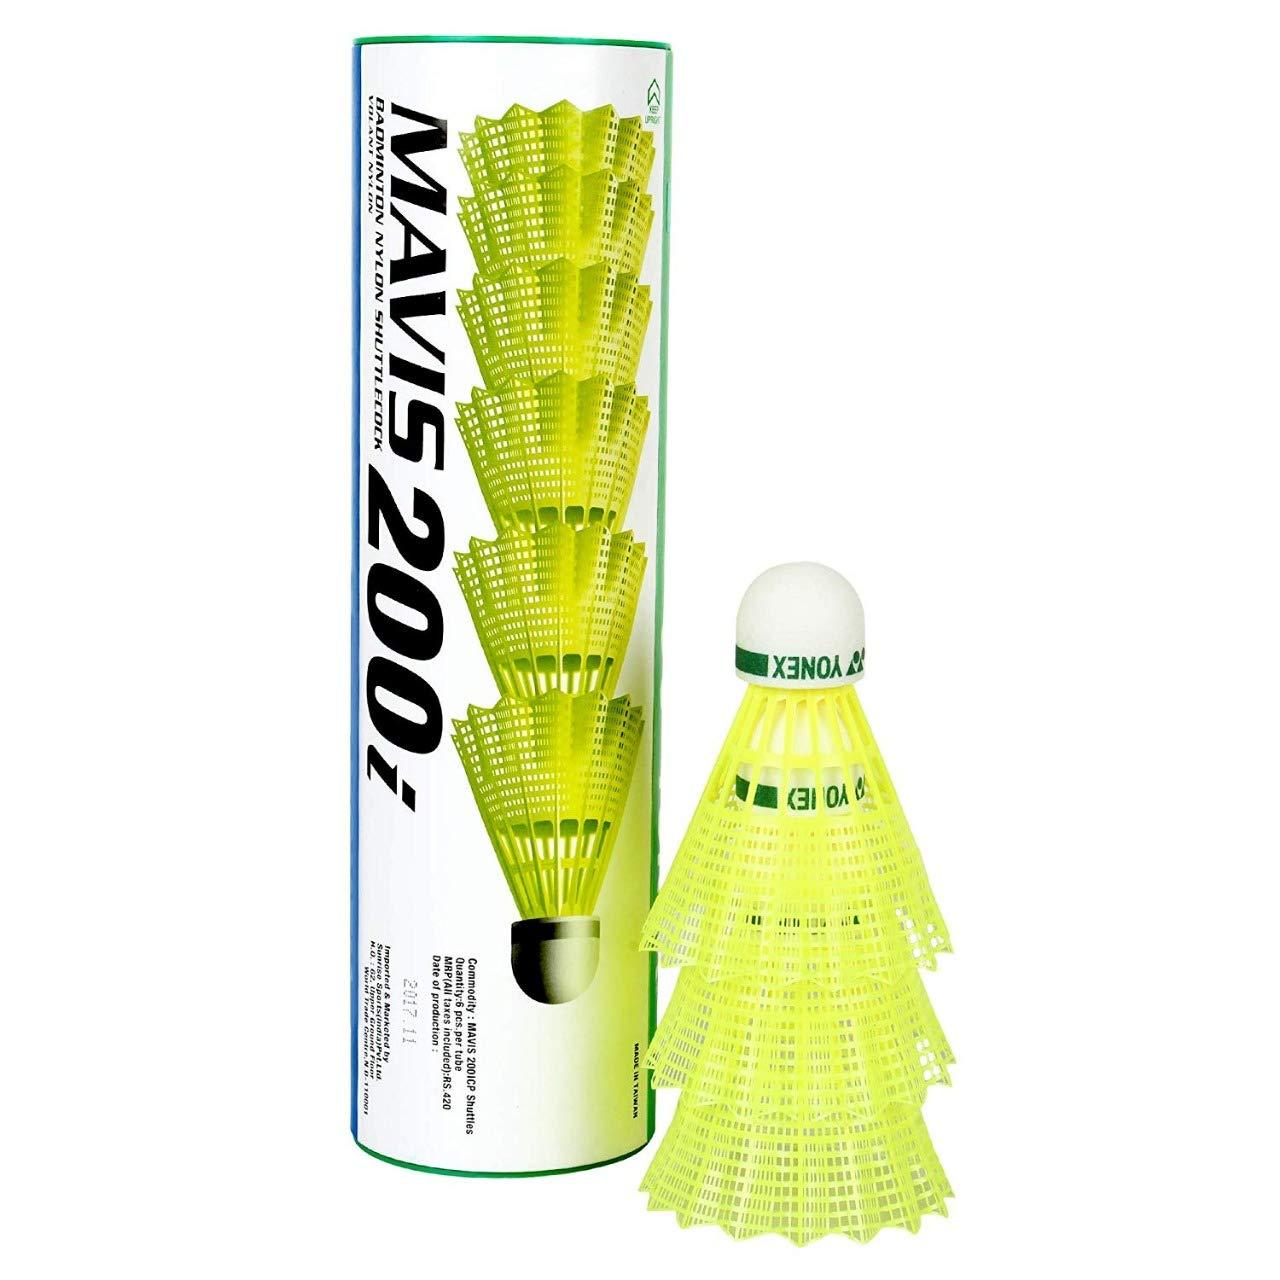 Yonex Badminton Set Of 2 Voltric LD 200 Racket With 1 Mavis 10 Shuttlecock